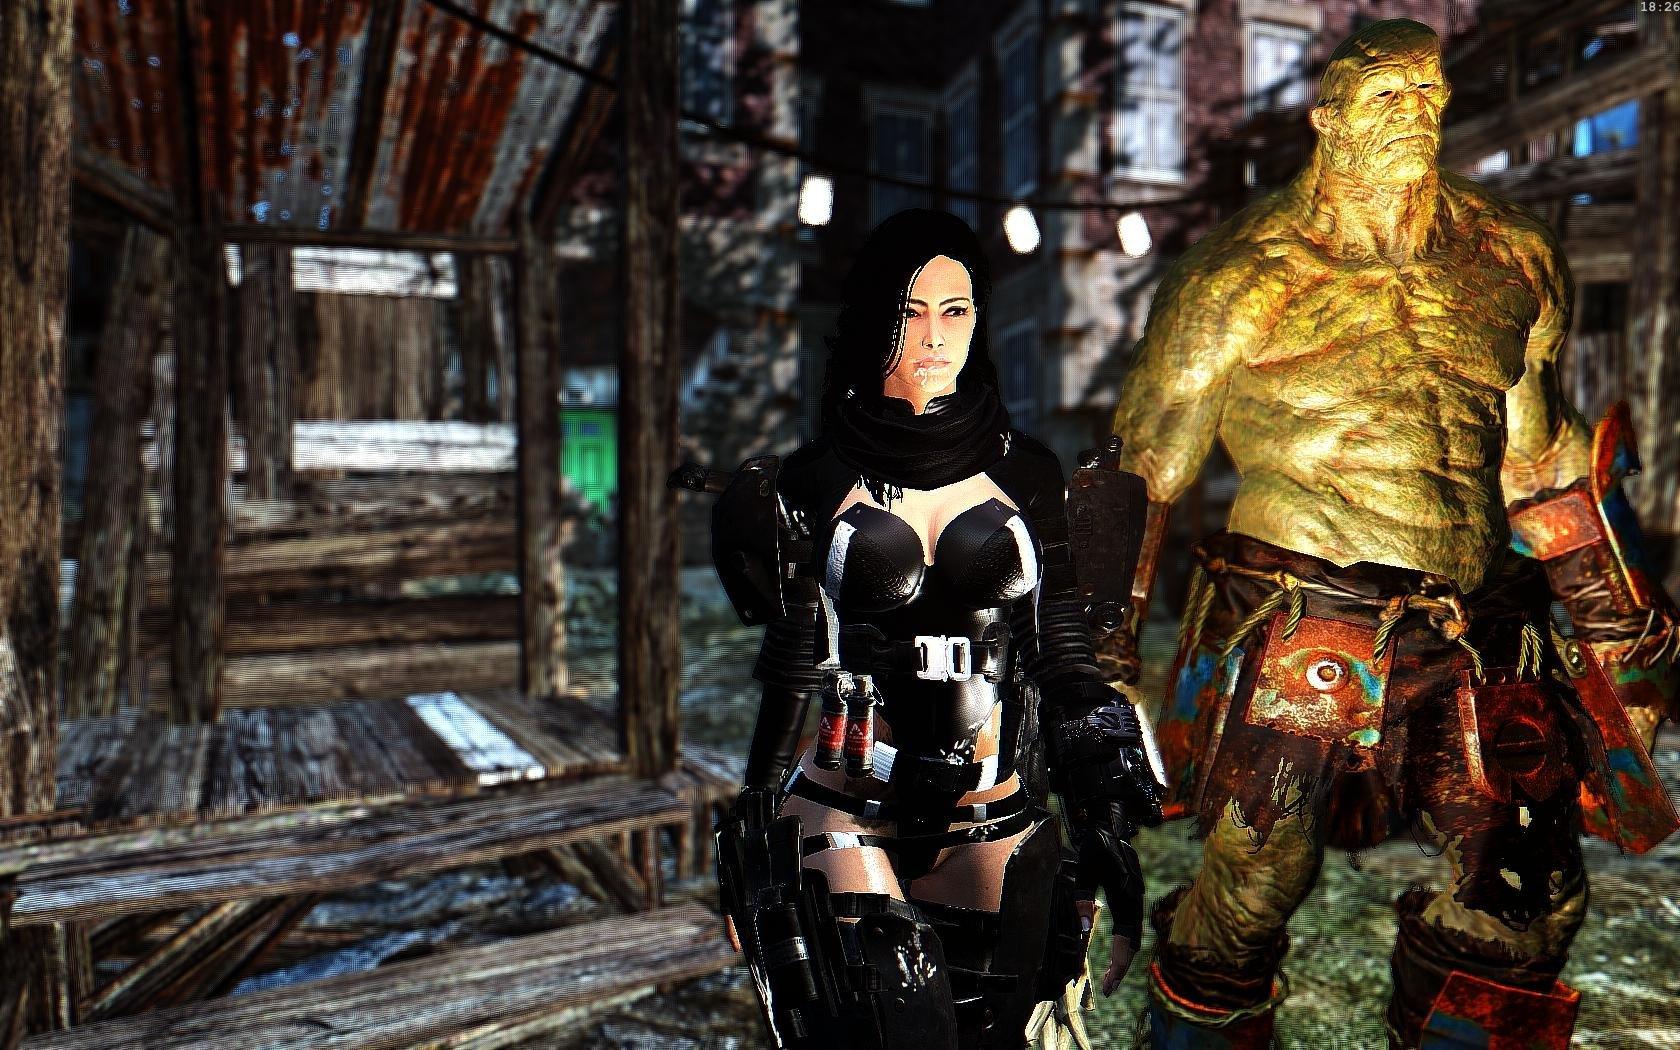 Fallout4 2018-10-27 18-26-20-90.jpg